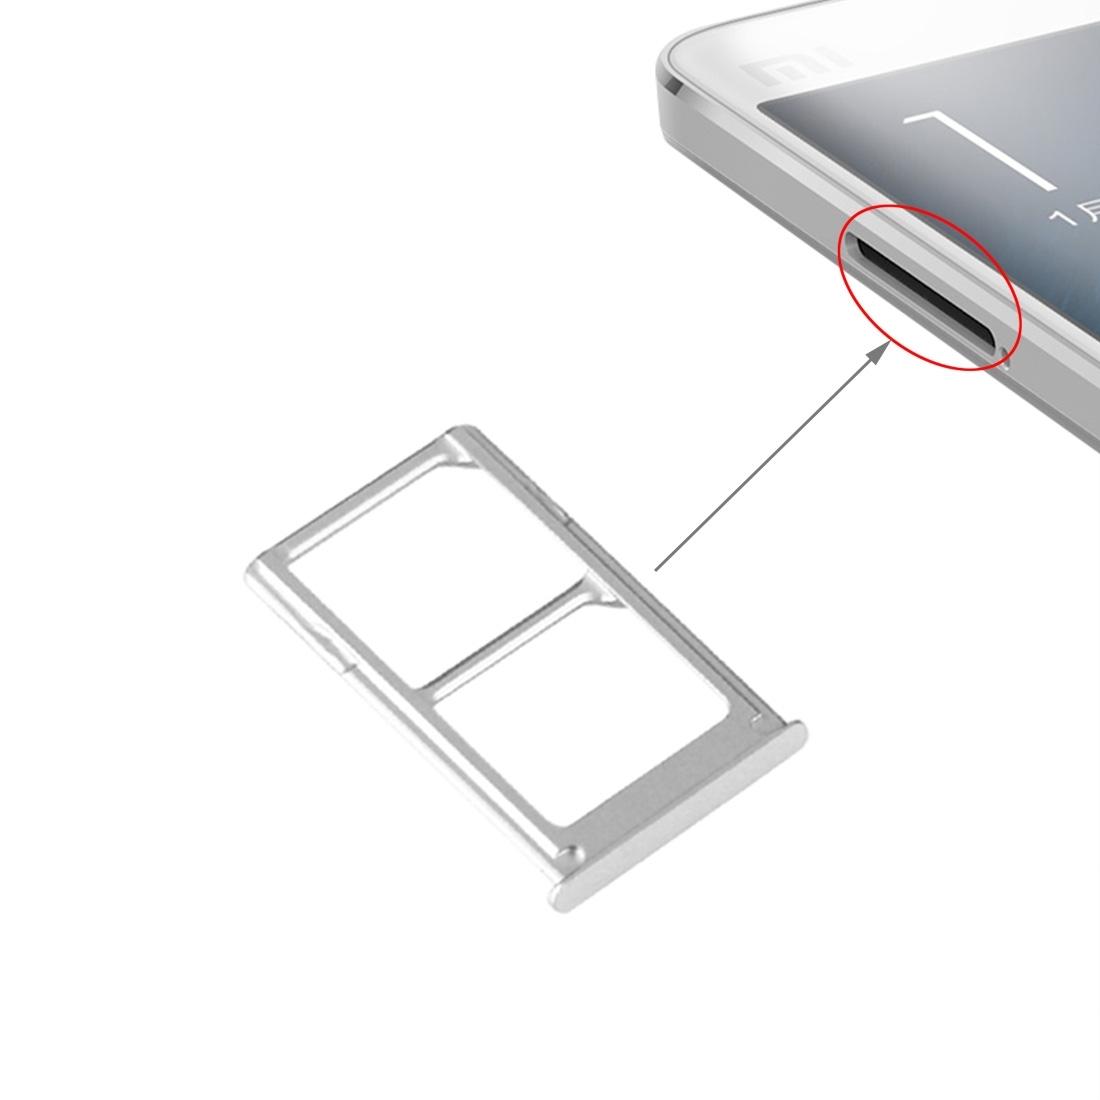 Original for Xiaomi Mi 5 Mi5 M5 Nano SIM Card Tray Holder Slot Adapter Replacement Repair Parts Black SilverTested